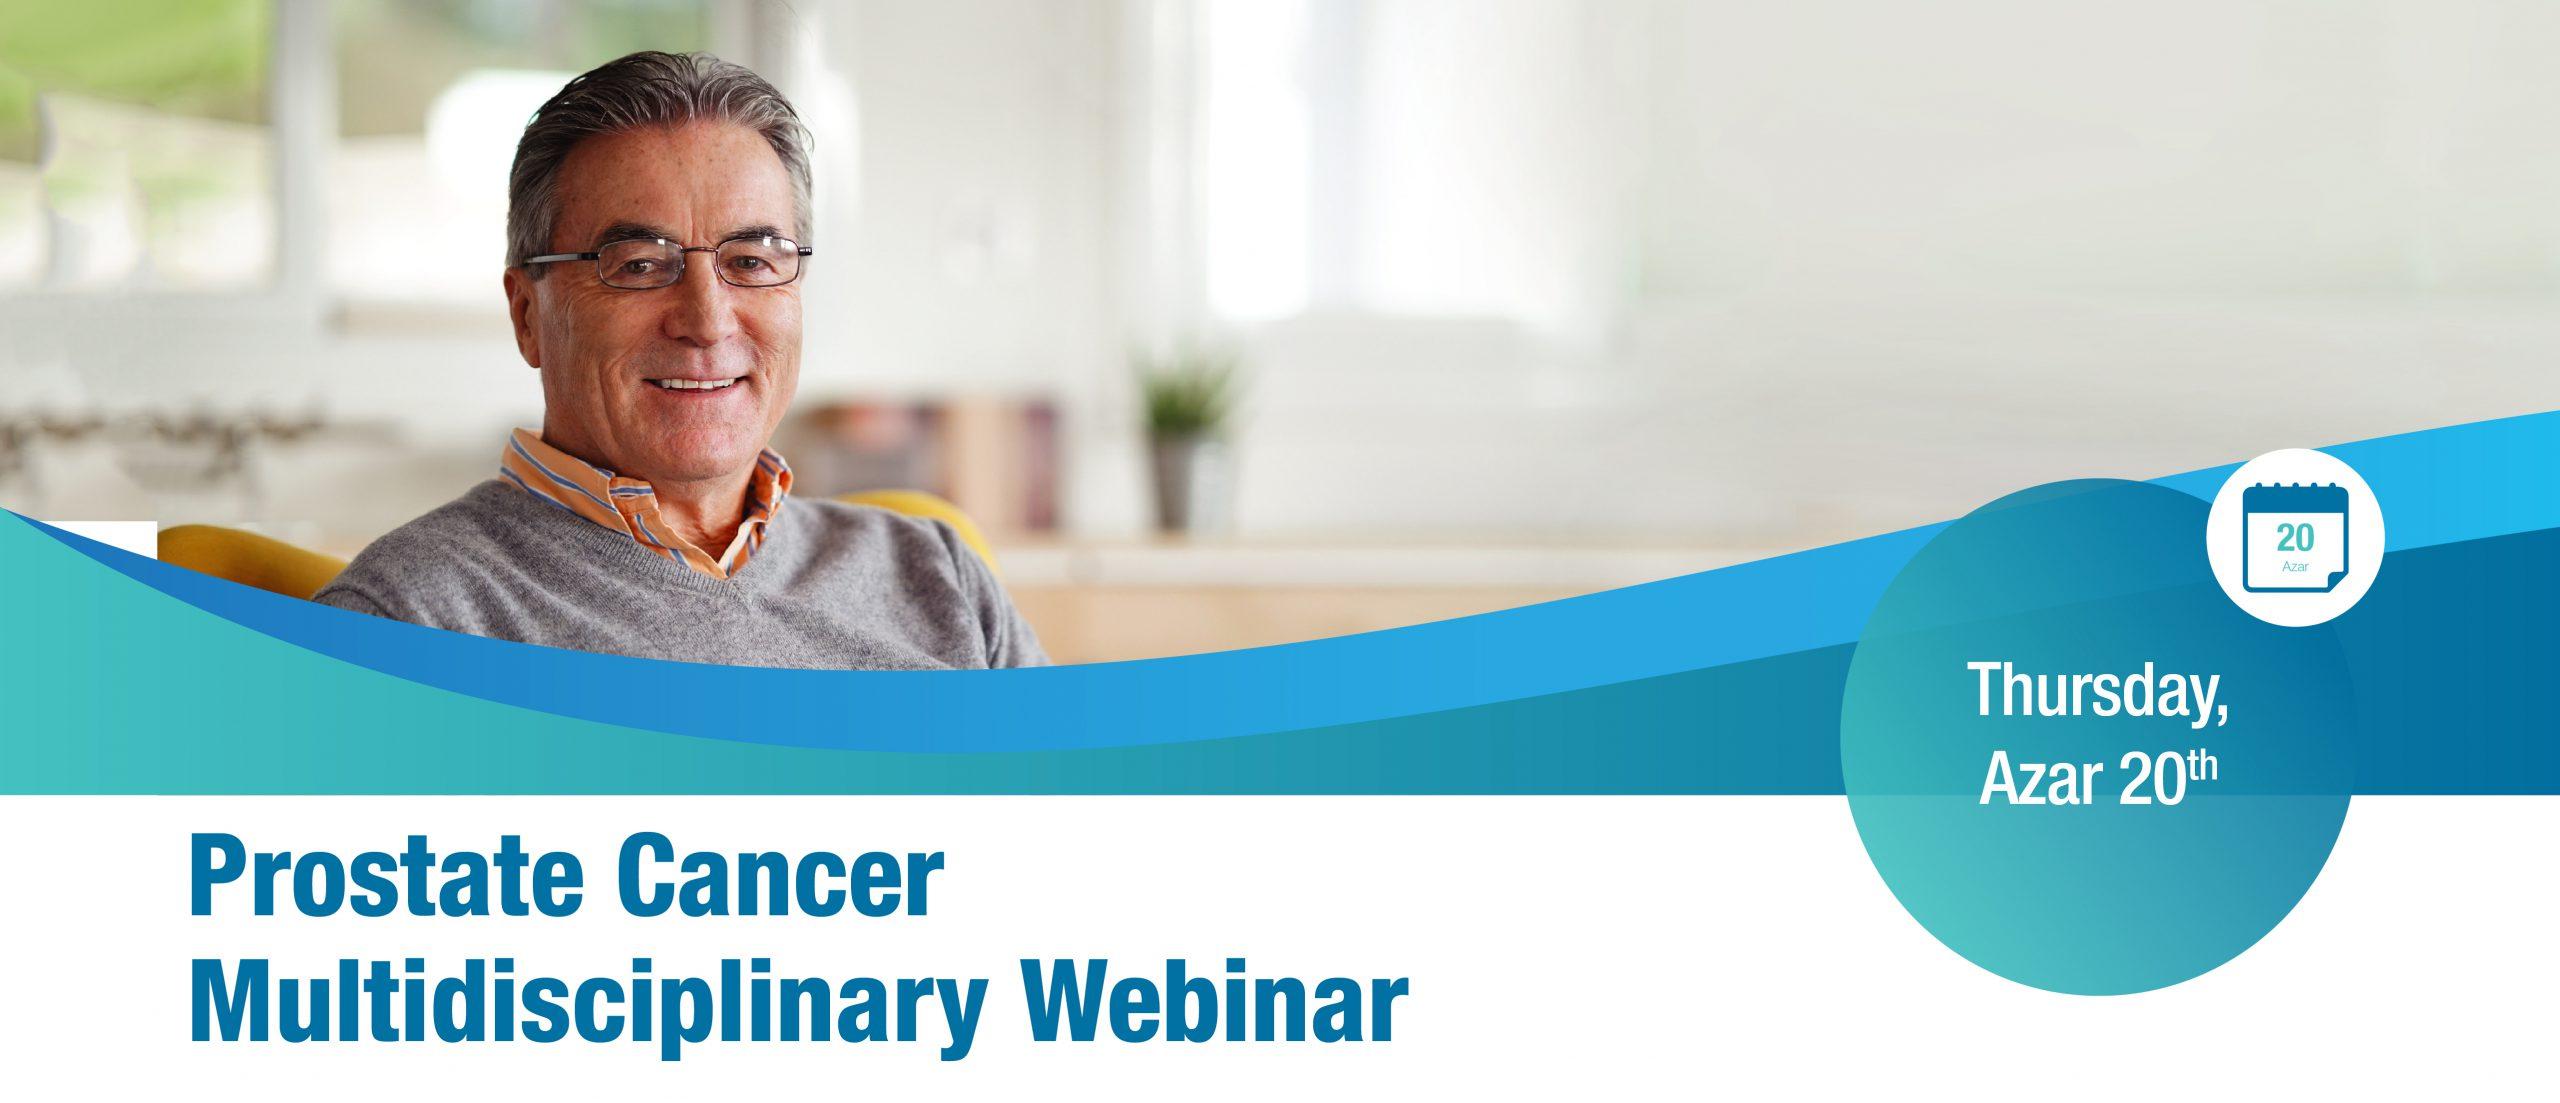 Prostate Cancer Multidisciplinary Webinar